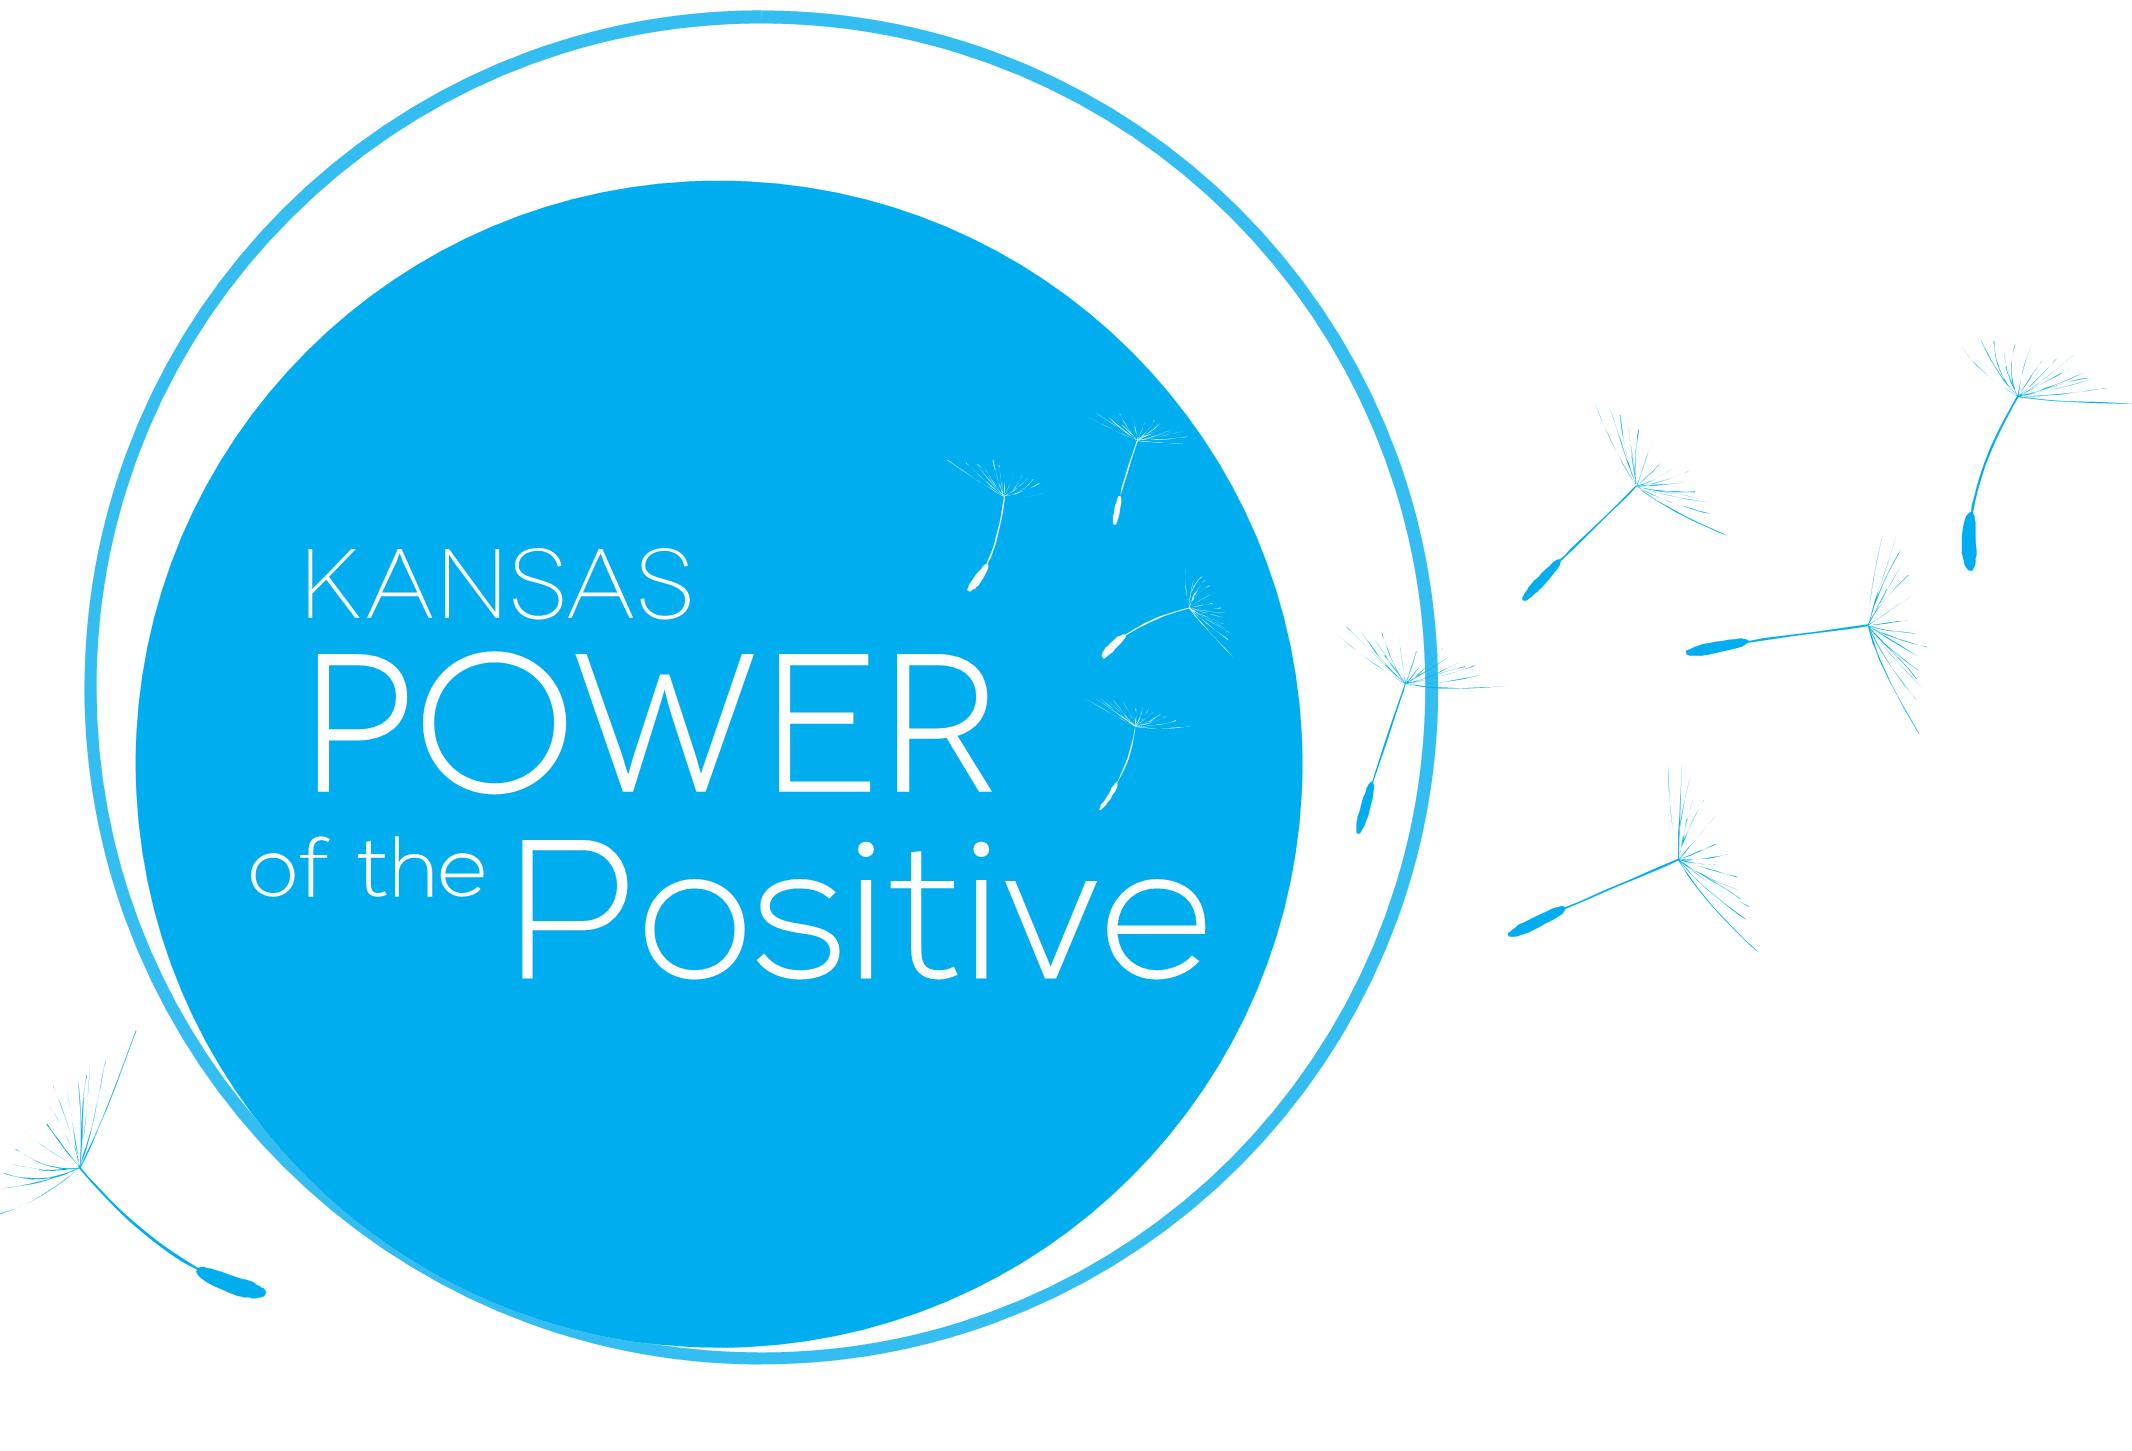 Wsu environmental health safety environmental health - Three Backbone Agencies Make Up The Kpop Leadership Team The Kansas Department Of Health And Environment Kdhe Wichita State University Community